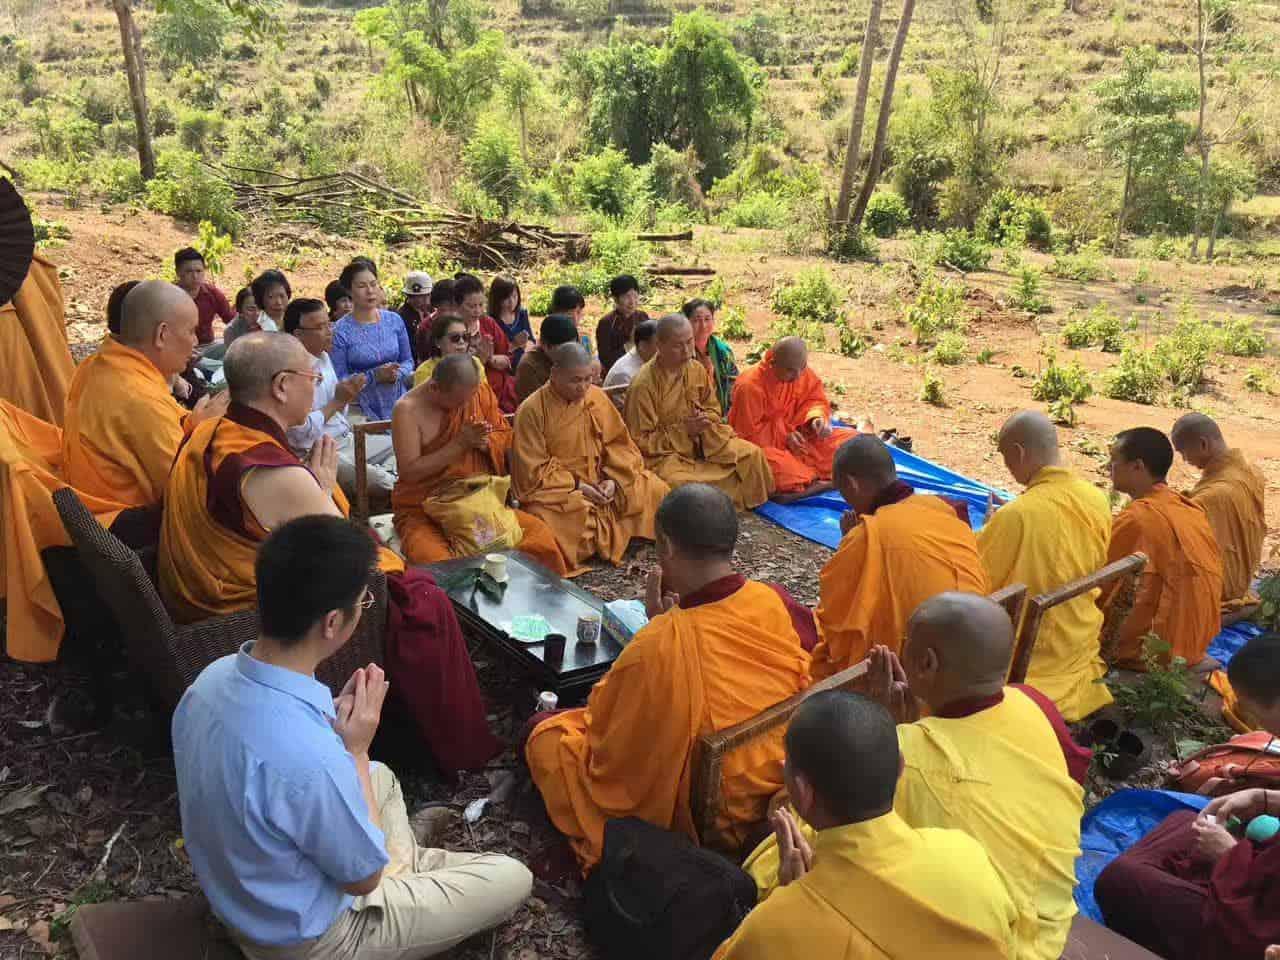 Gosok Rinpoche Thailand 2017 T004 fe03d4415cae6854532c96b203a5626